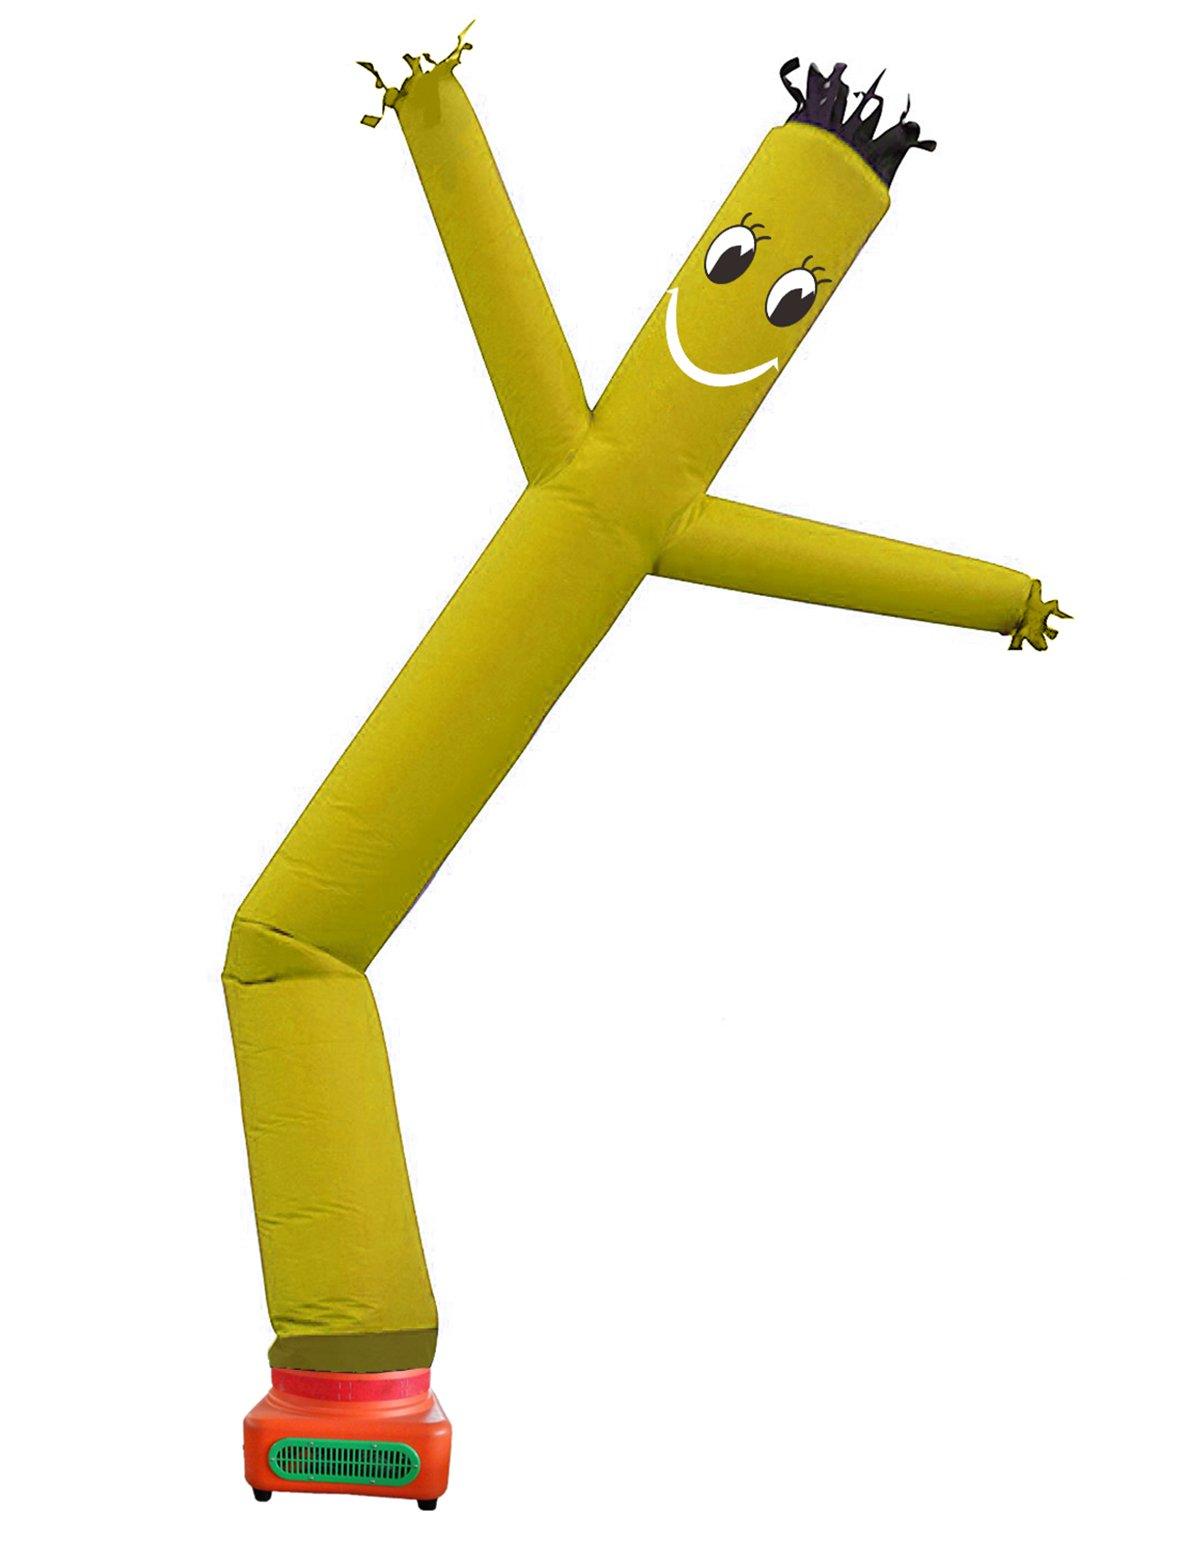 10 Feet Promtion single leg Tube Cartoon,Sky Puppet tube man Dancer, Advertising Windy Moving Dancer Man,inflatable wave man (orange)